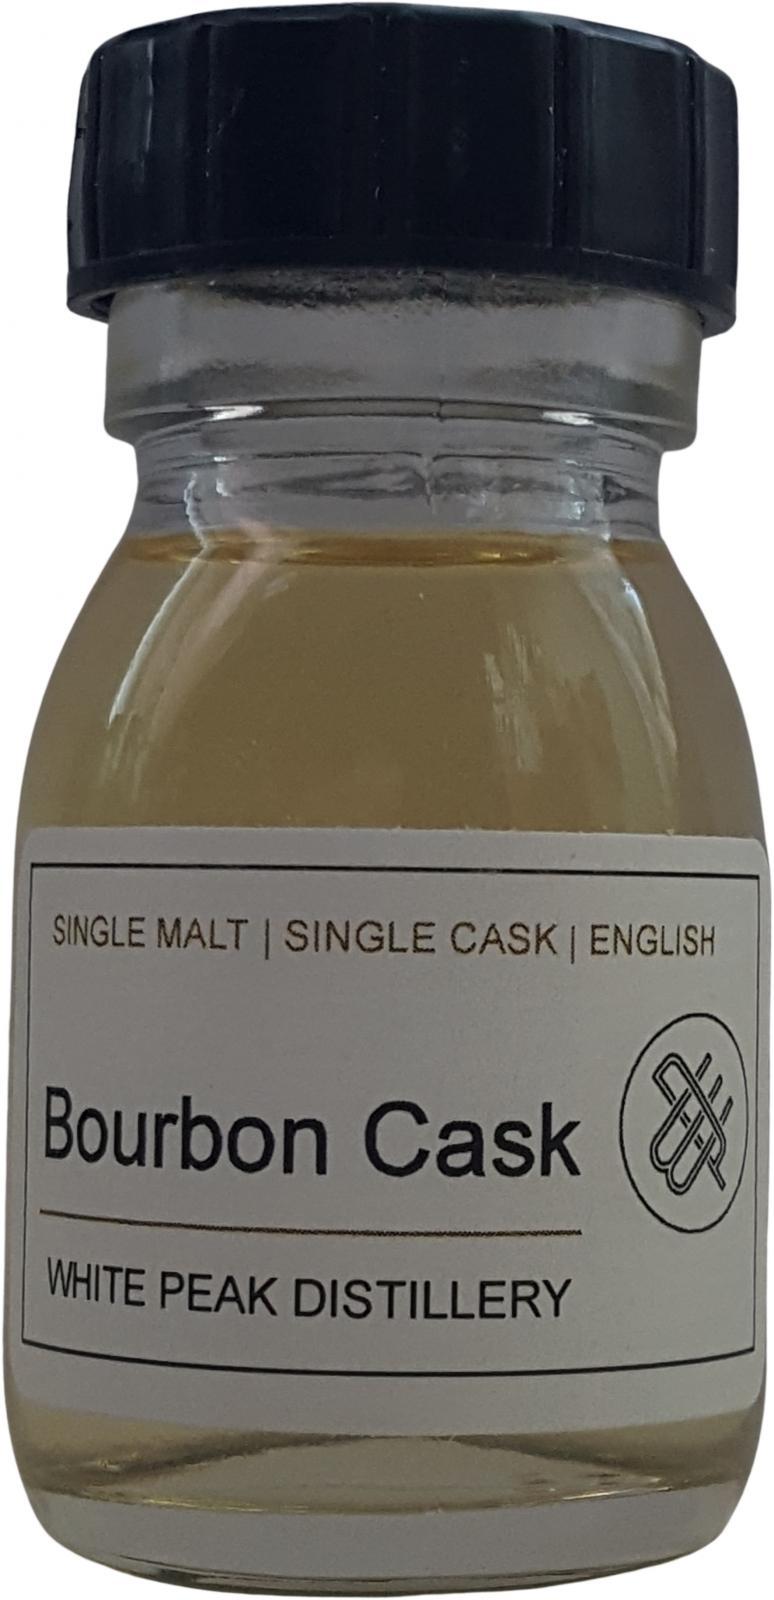 White Peak Bourbon Cask